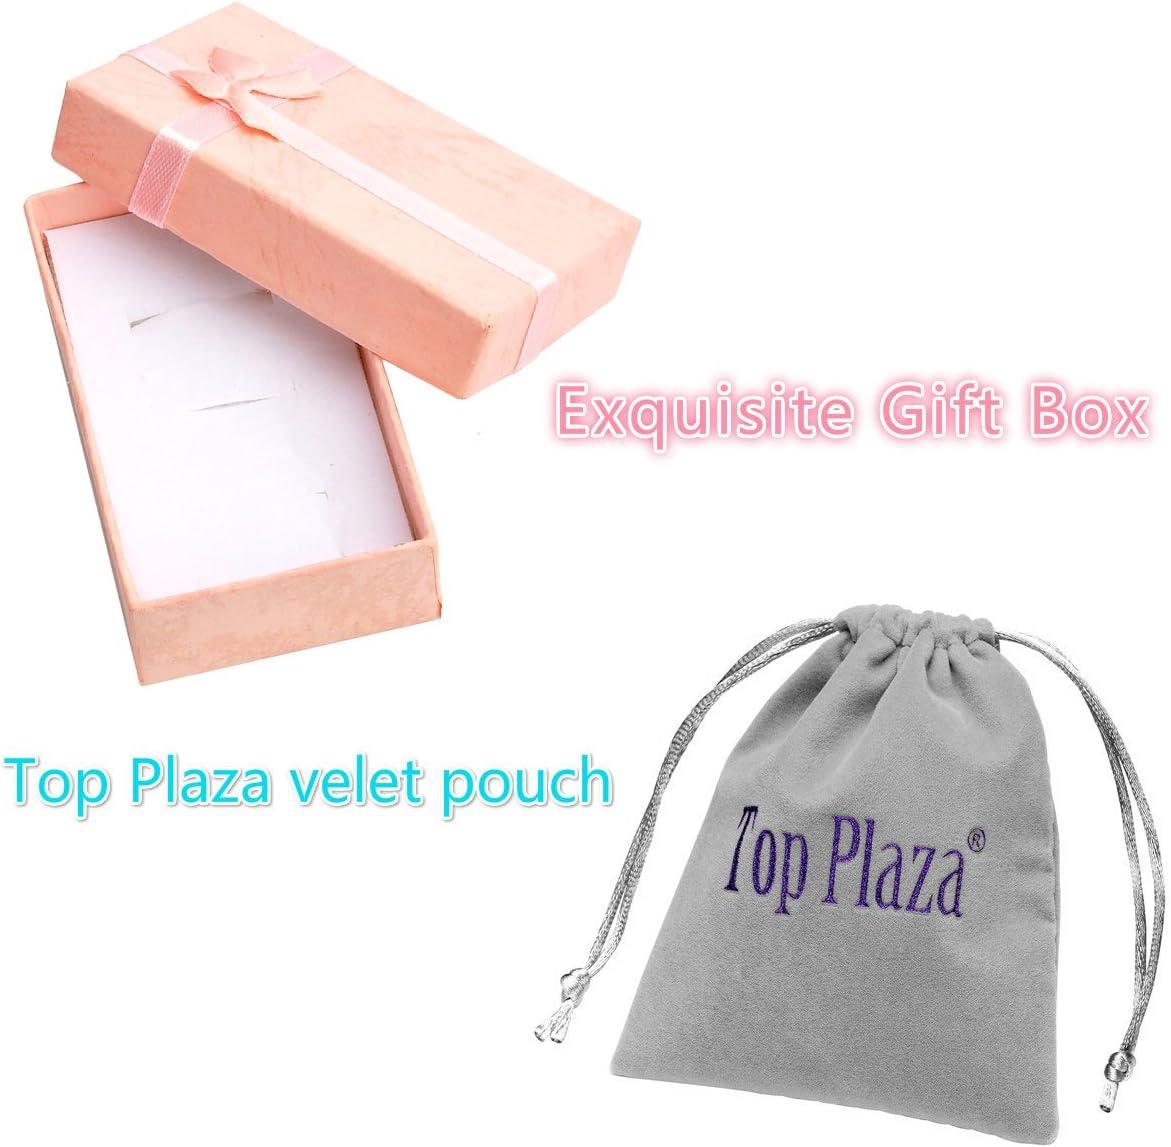 Top Plaza 7 Chakra Reiki Healing Crystals Yoga Balance Irregular Shape Polished Tumbled Palm Stones W// 7 Chakra Healing Crystal Bracelet #1